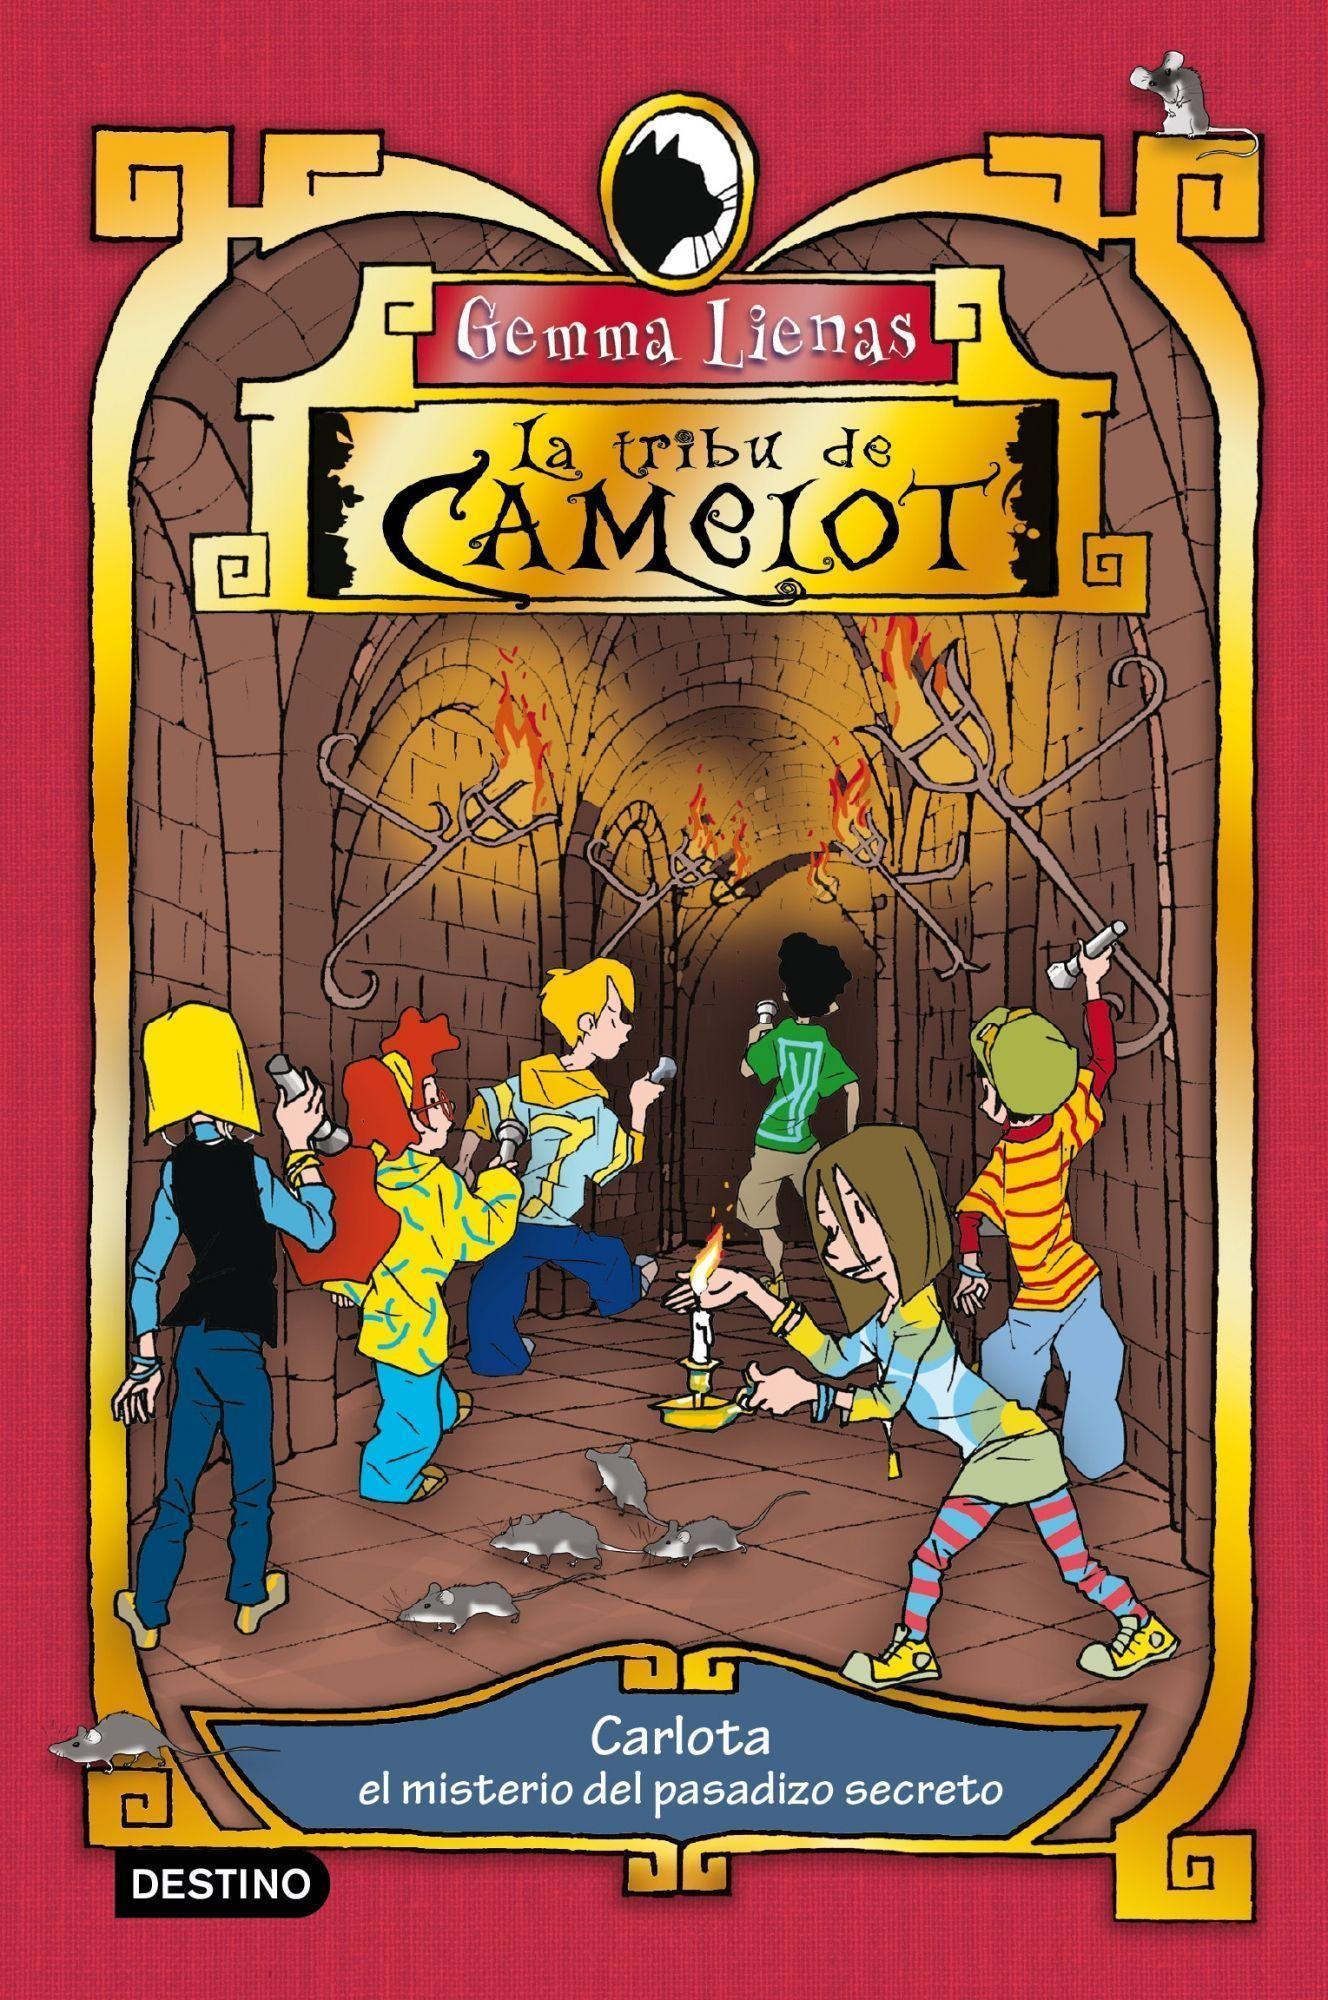 La Tribu De Camelot 2: Carlota Y El Misterio Del Pasadizo Secreto por Gemma Lienas